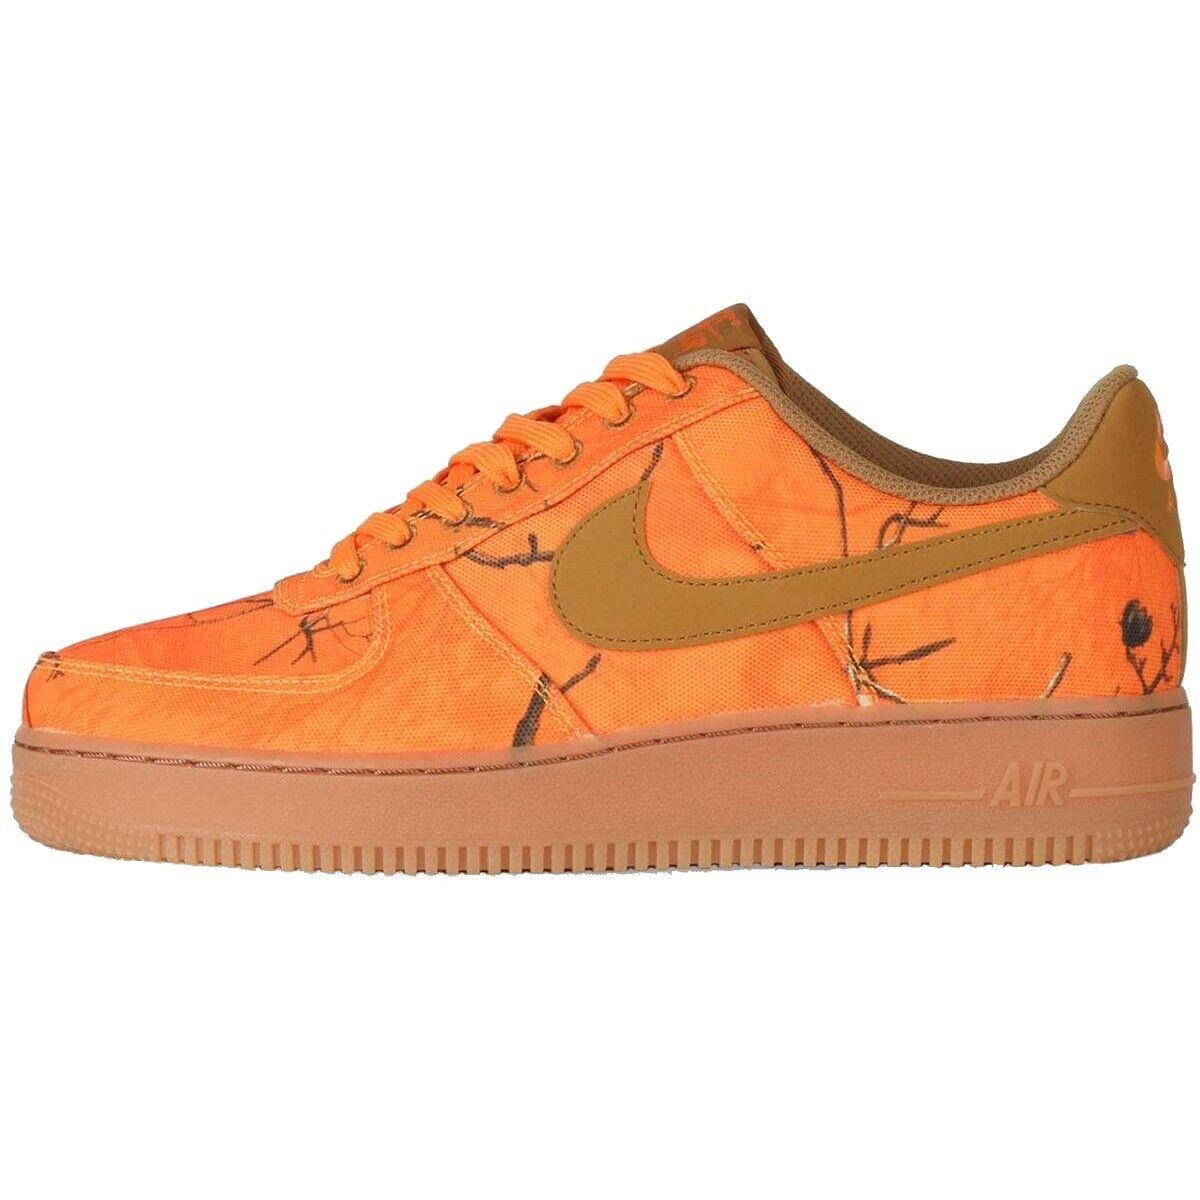 Nike Air Force 1 07 Lvb Realtree Ao2441-800 orange Mod.Ao2441-800